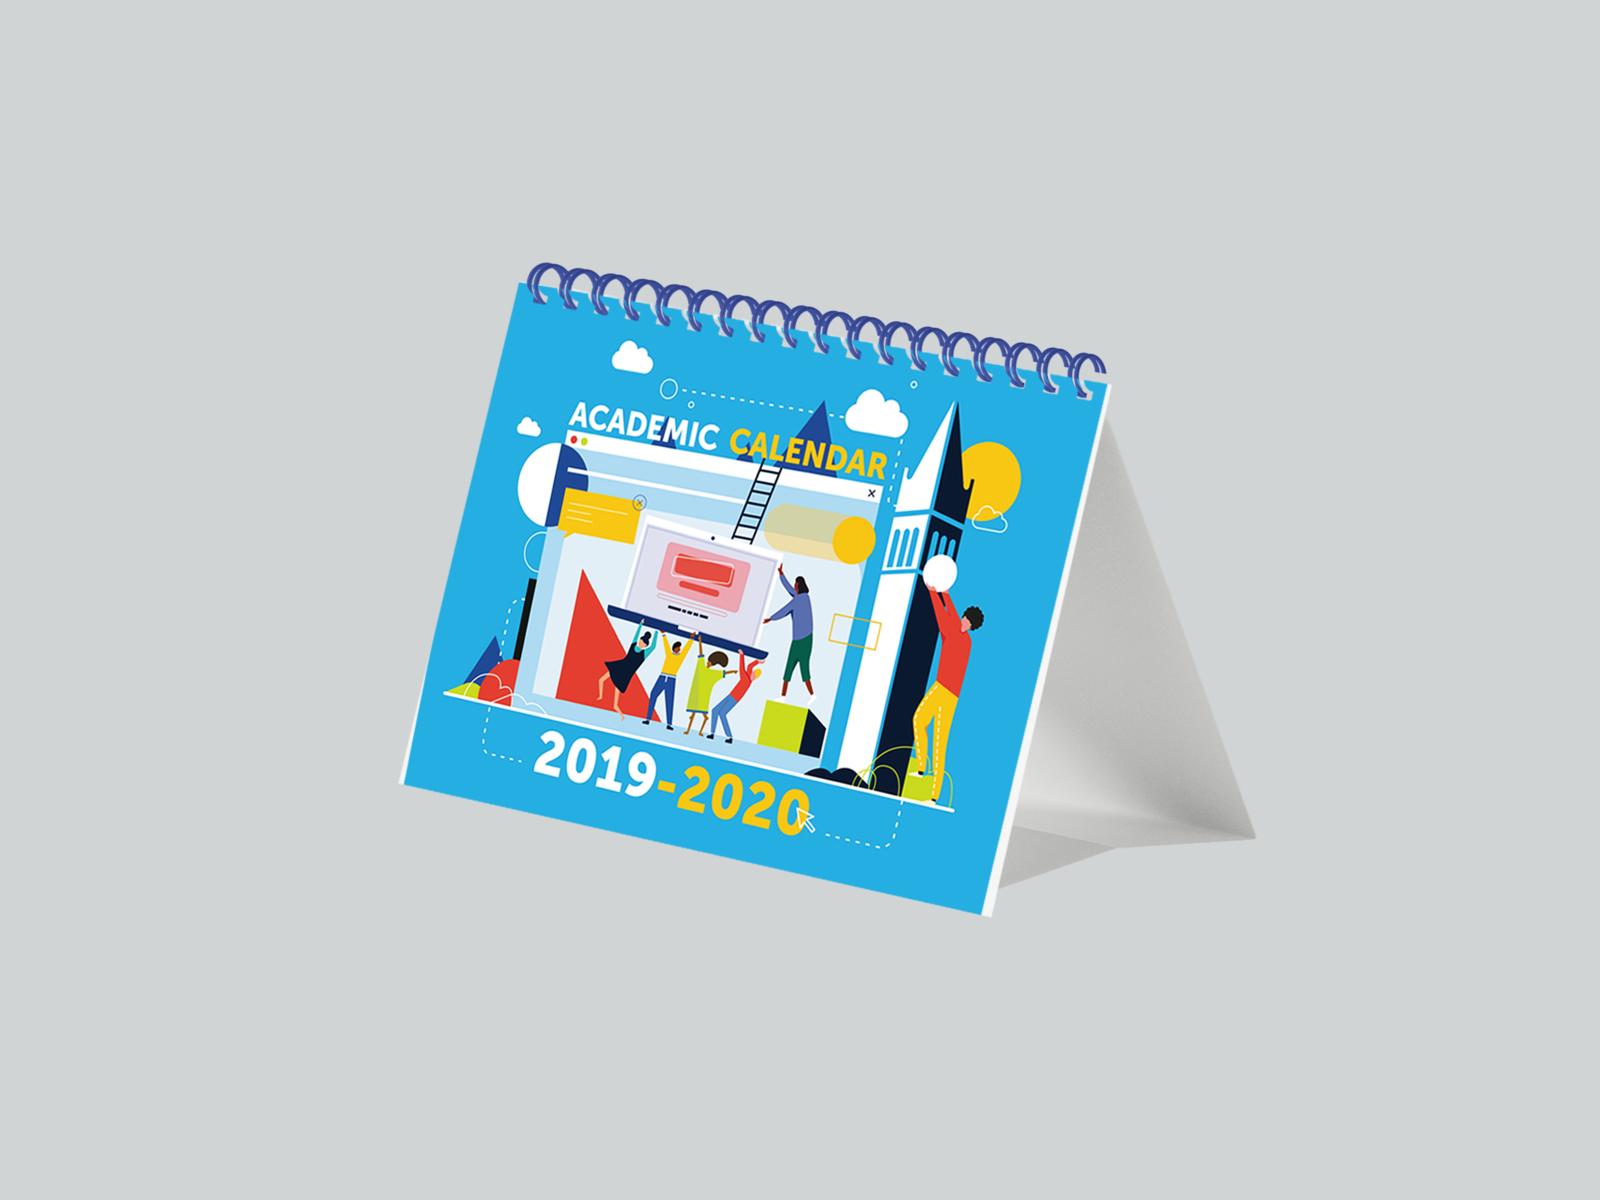 Uc Berkeley Sts Academic Calendar (201920) By Cherry Wu On with regard to Berkeley Academic Calendar